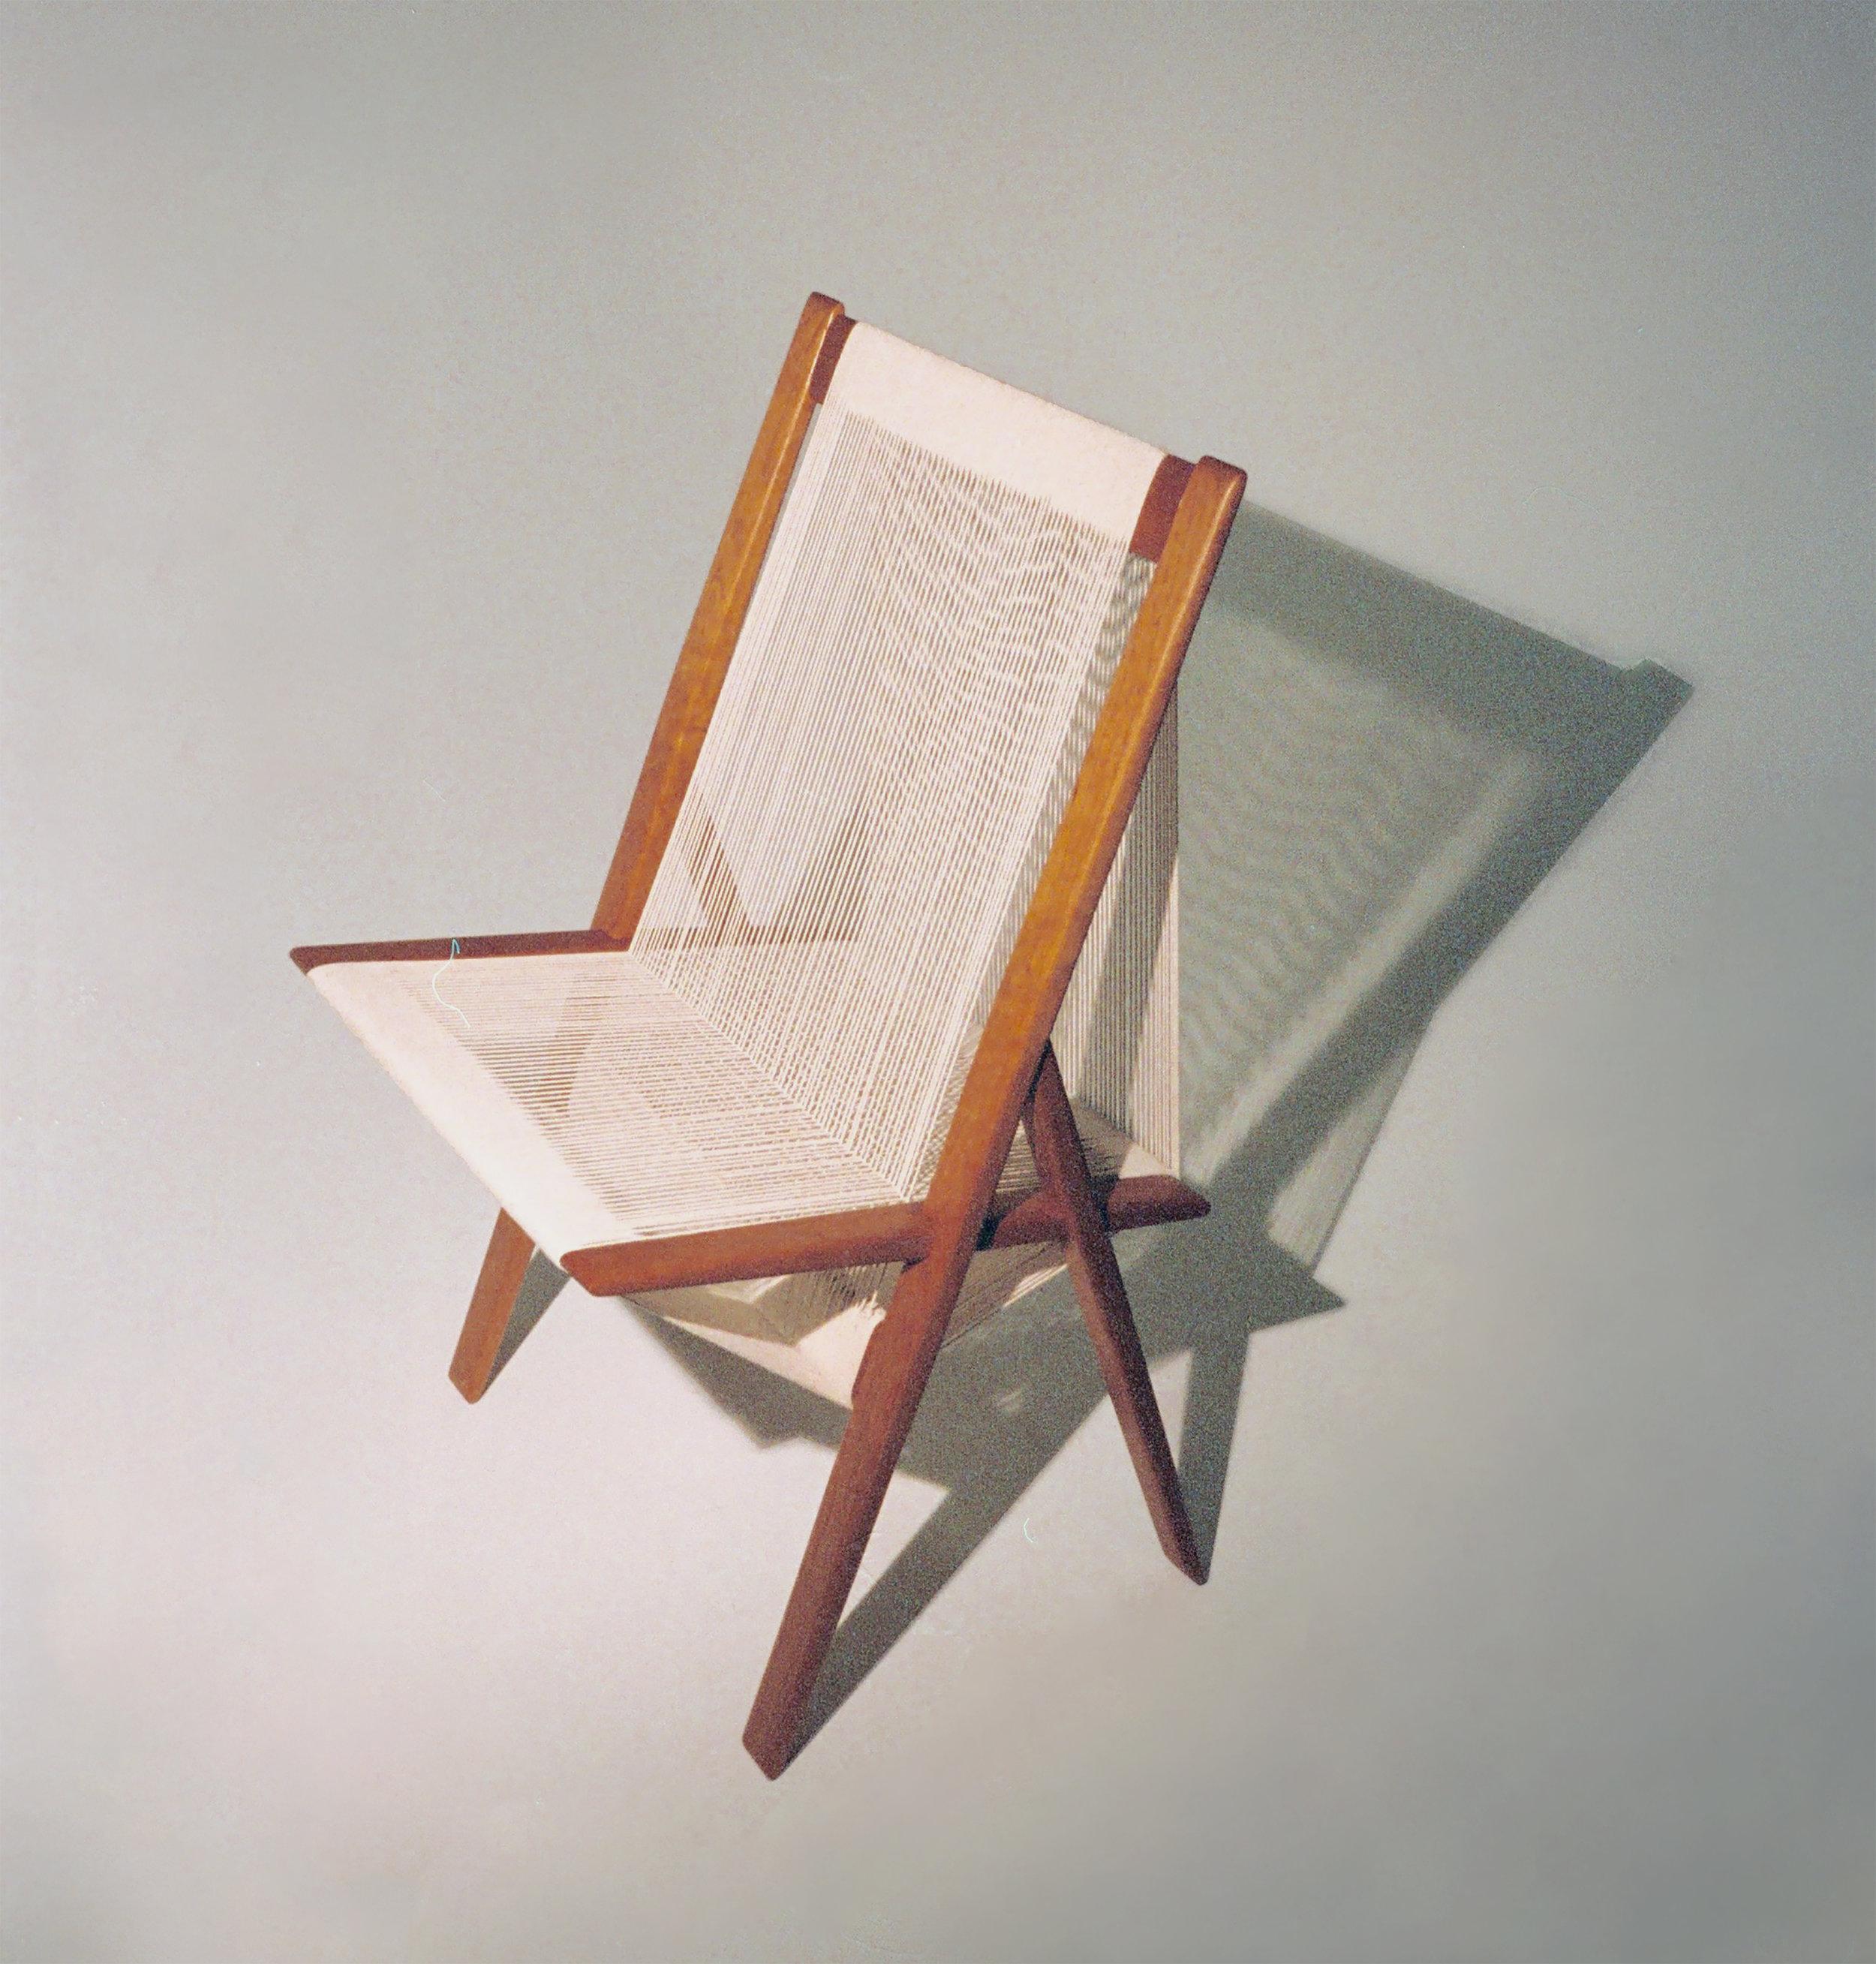 loom chair, 2018